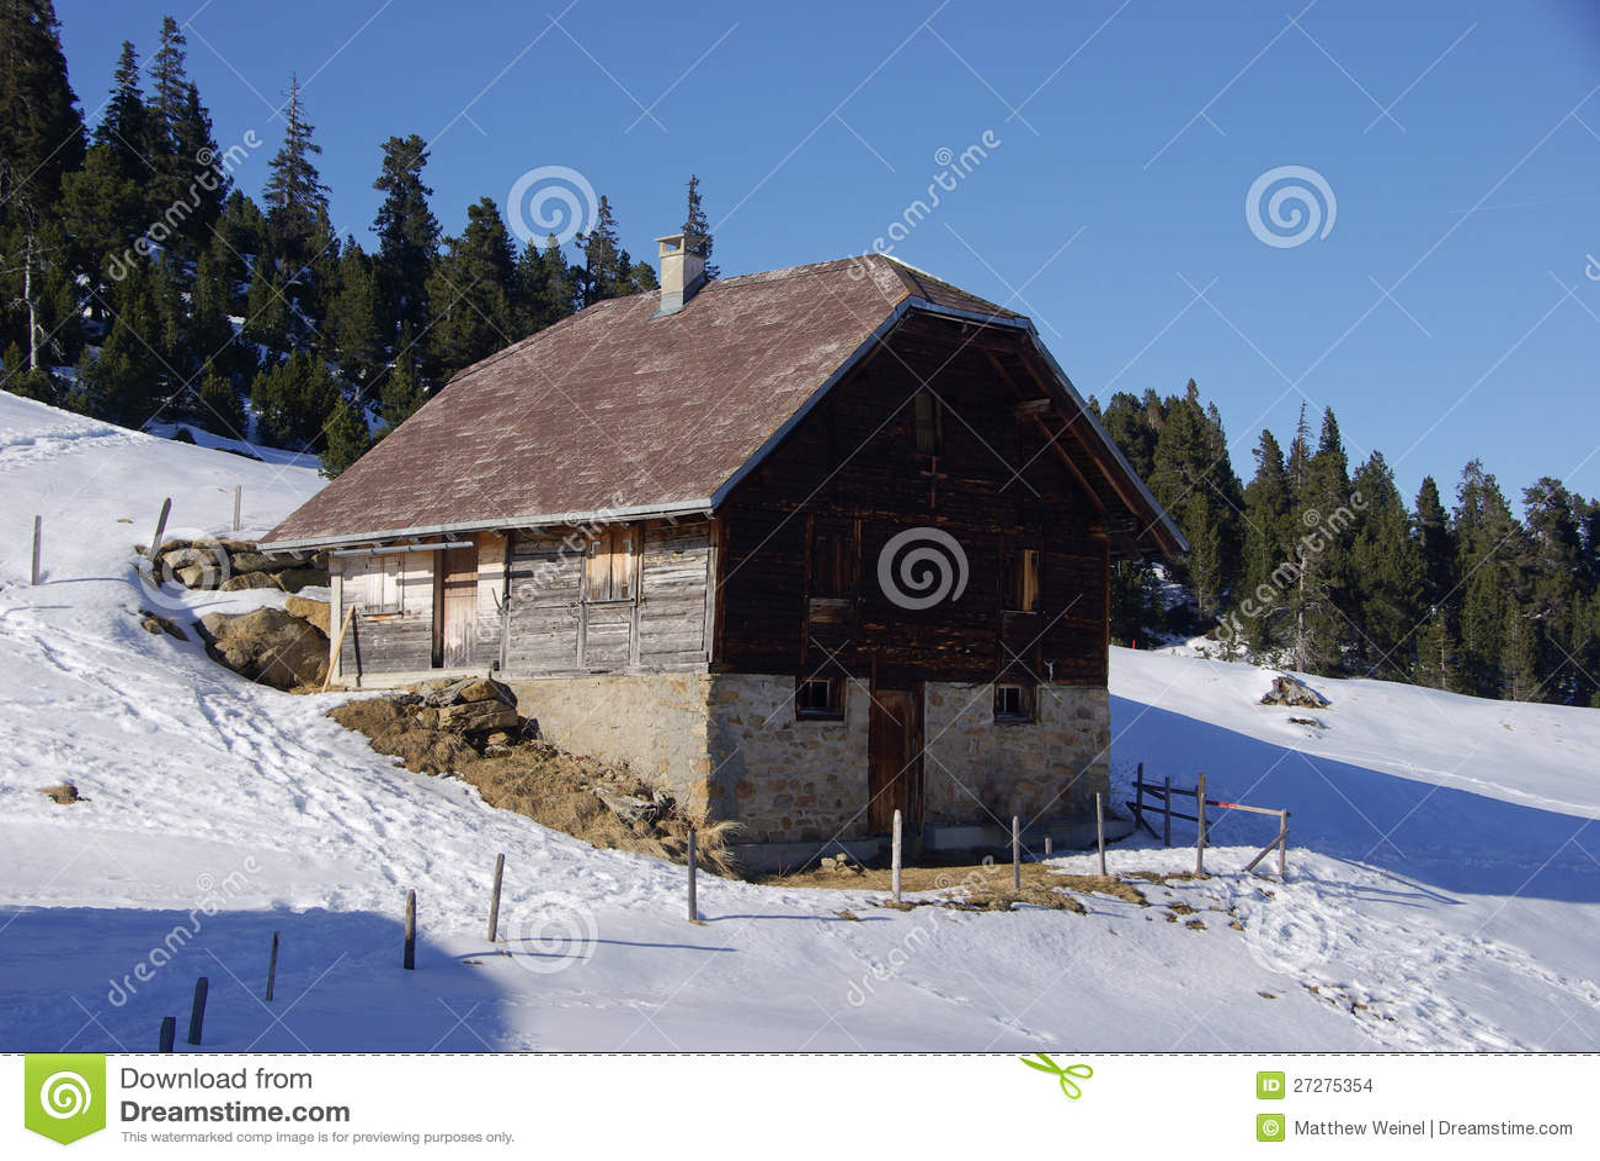 Chalé na montanha nevado